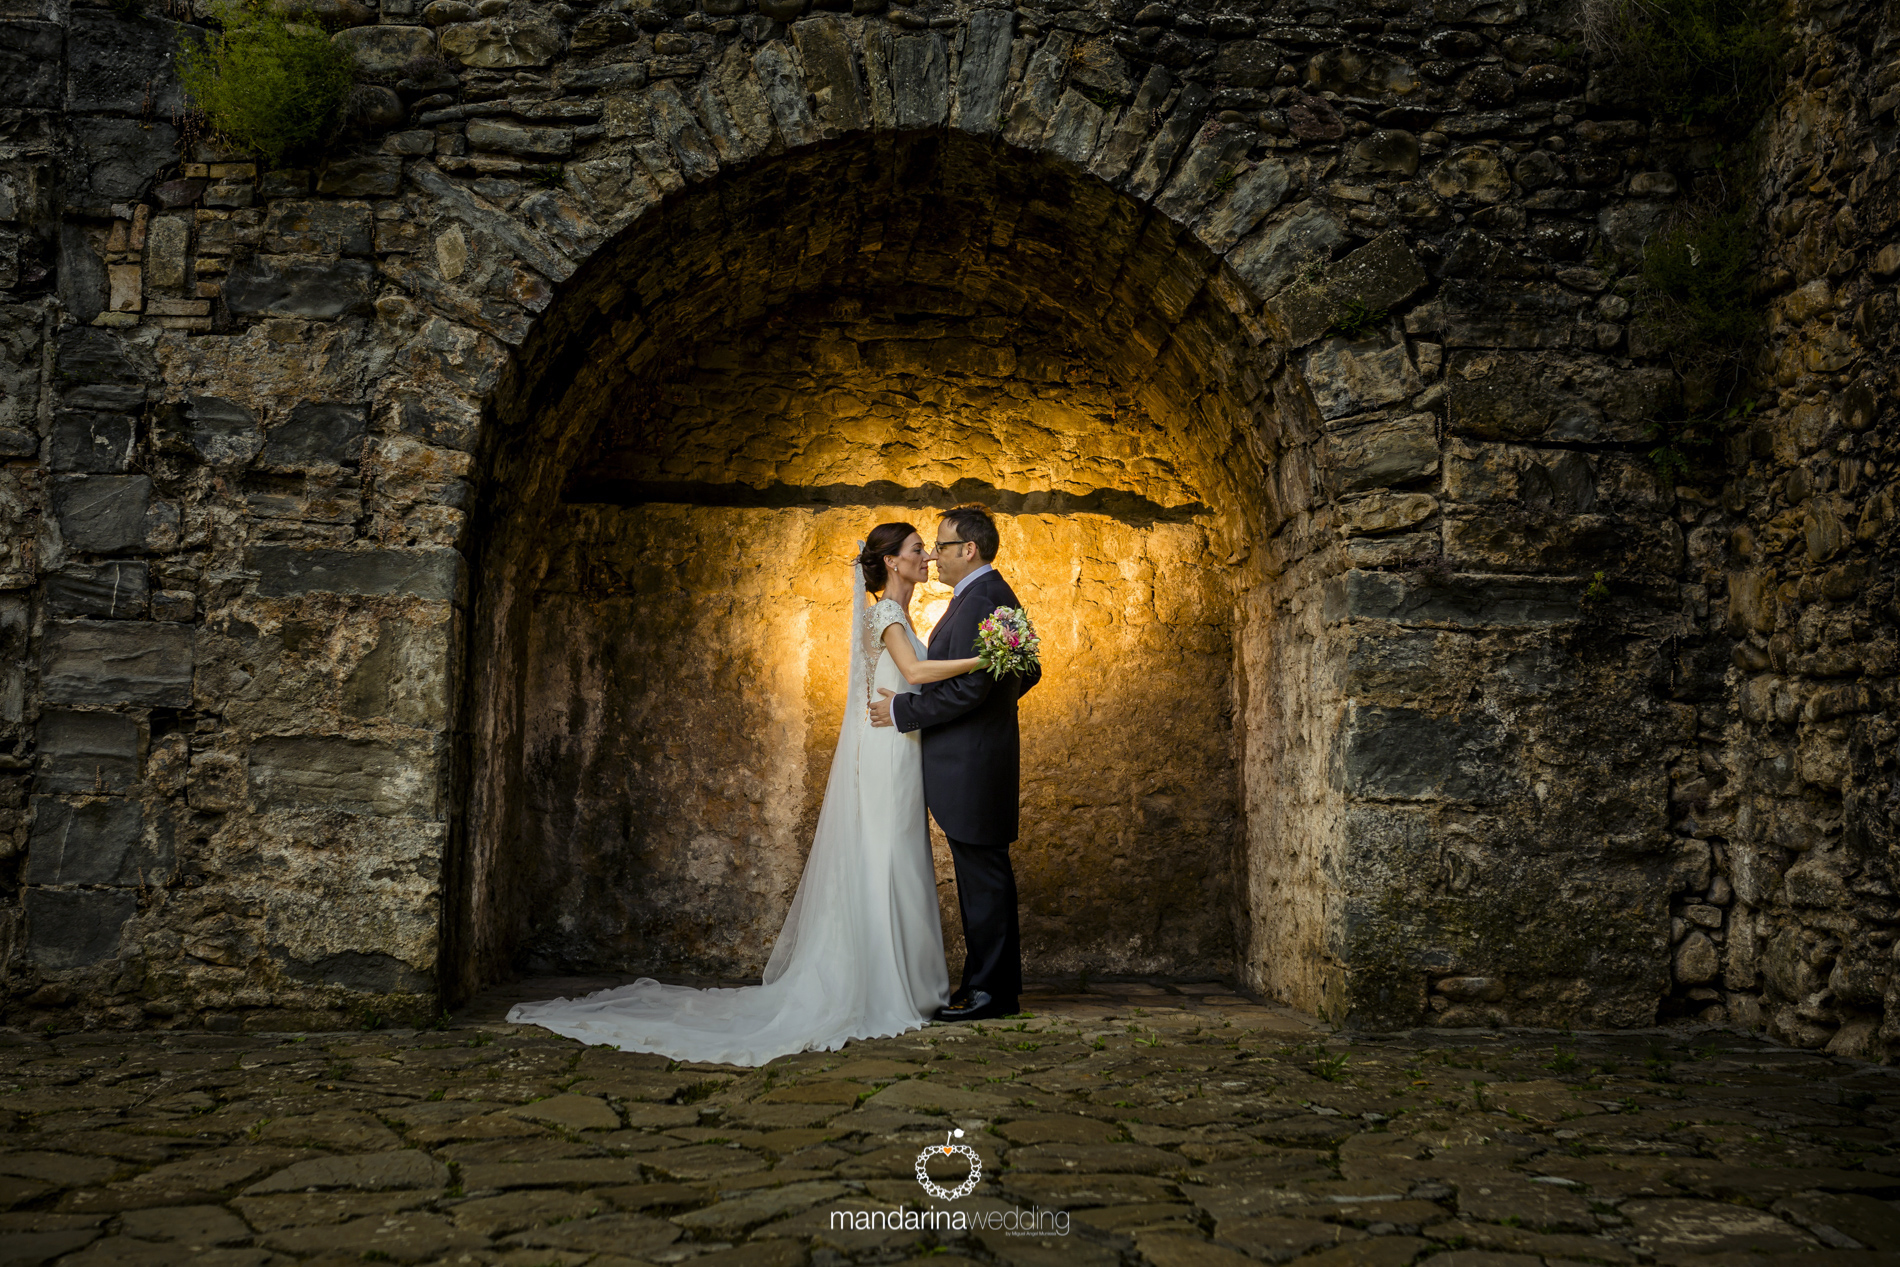 mandaria wedding, fotografos de boda, fotoperiodismo de boda, mejores fotografos de boda, bodas soria, bodas pirineo, bodas Madrid, fotógrafos tarragona_34